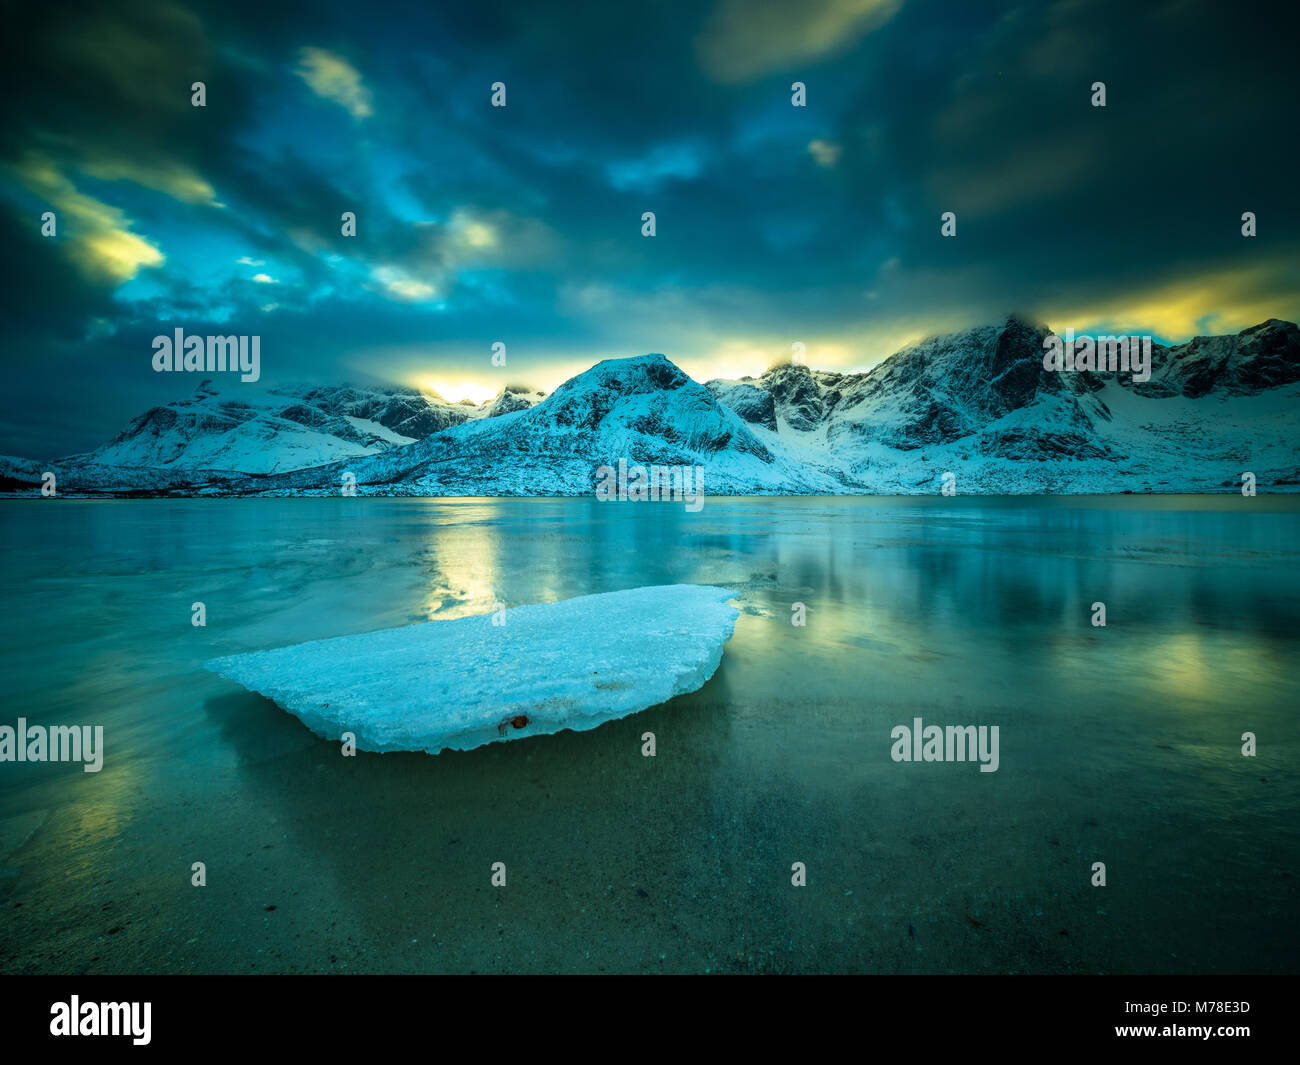 Winter scene from Lofoten Norway - Stock Image